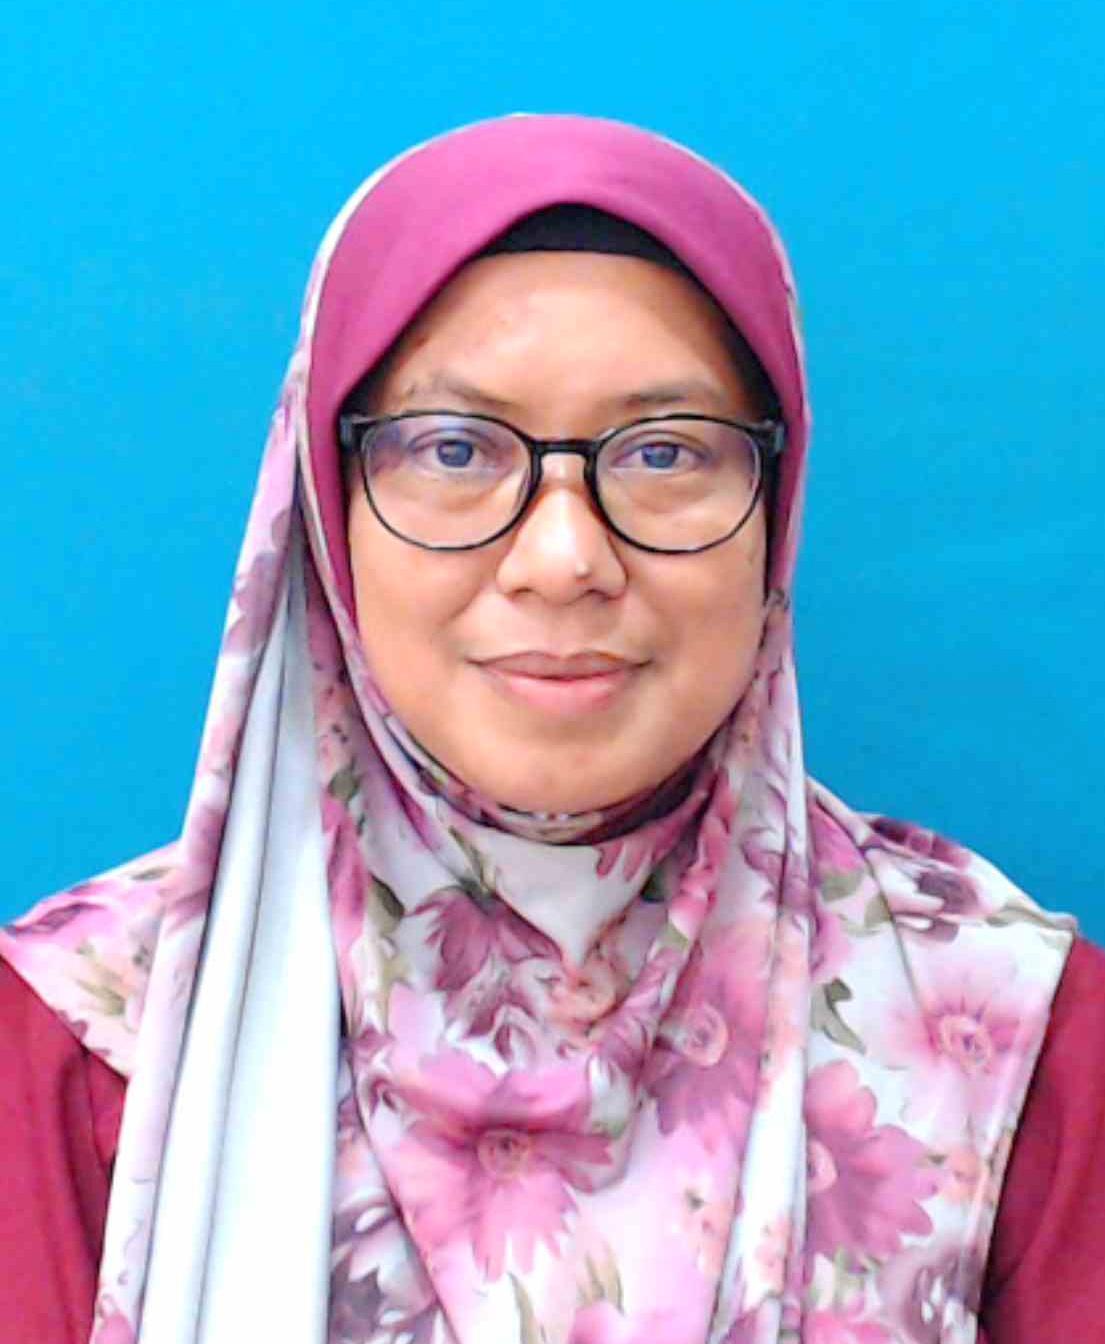 Siti Hadijah Binti Shamsudin